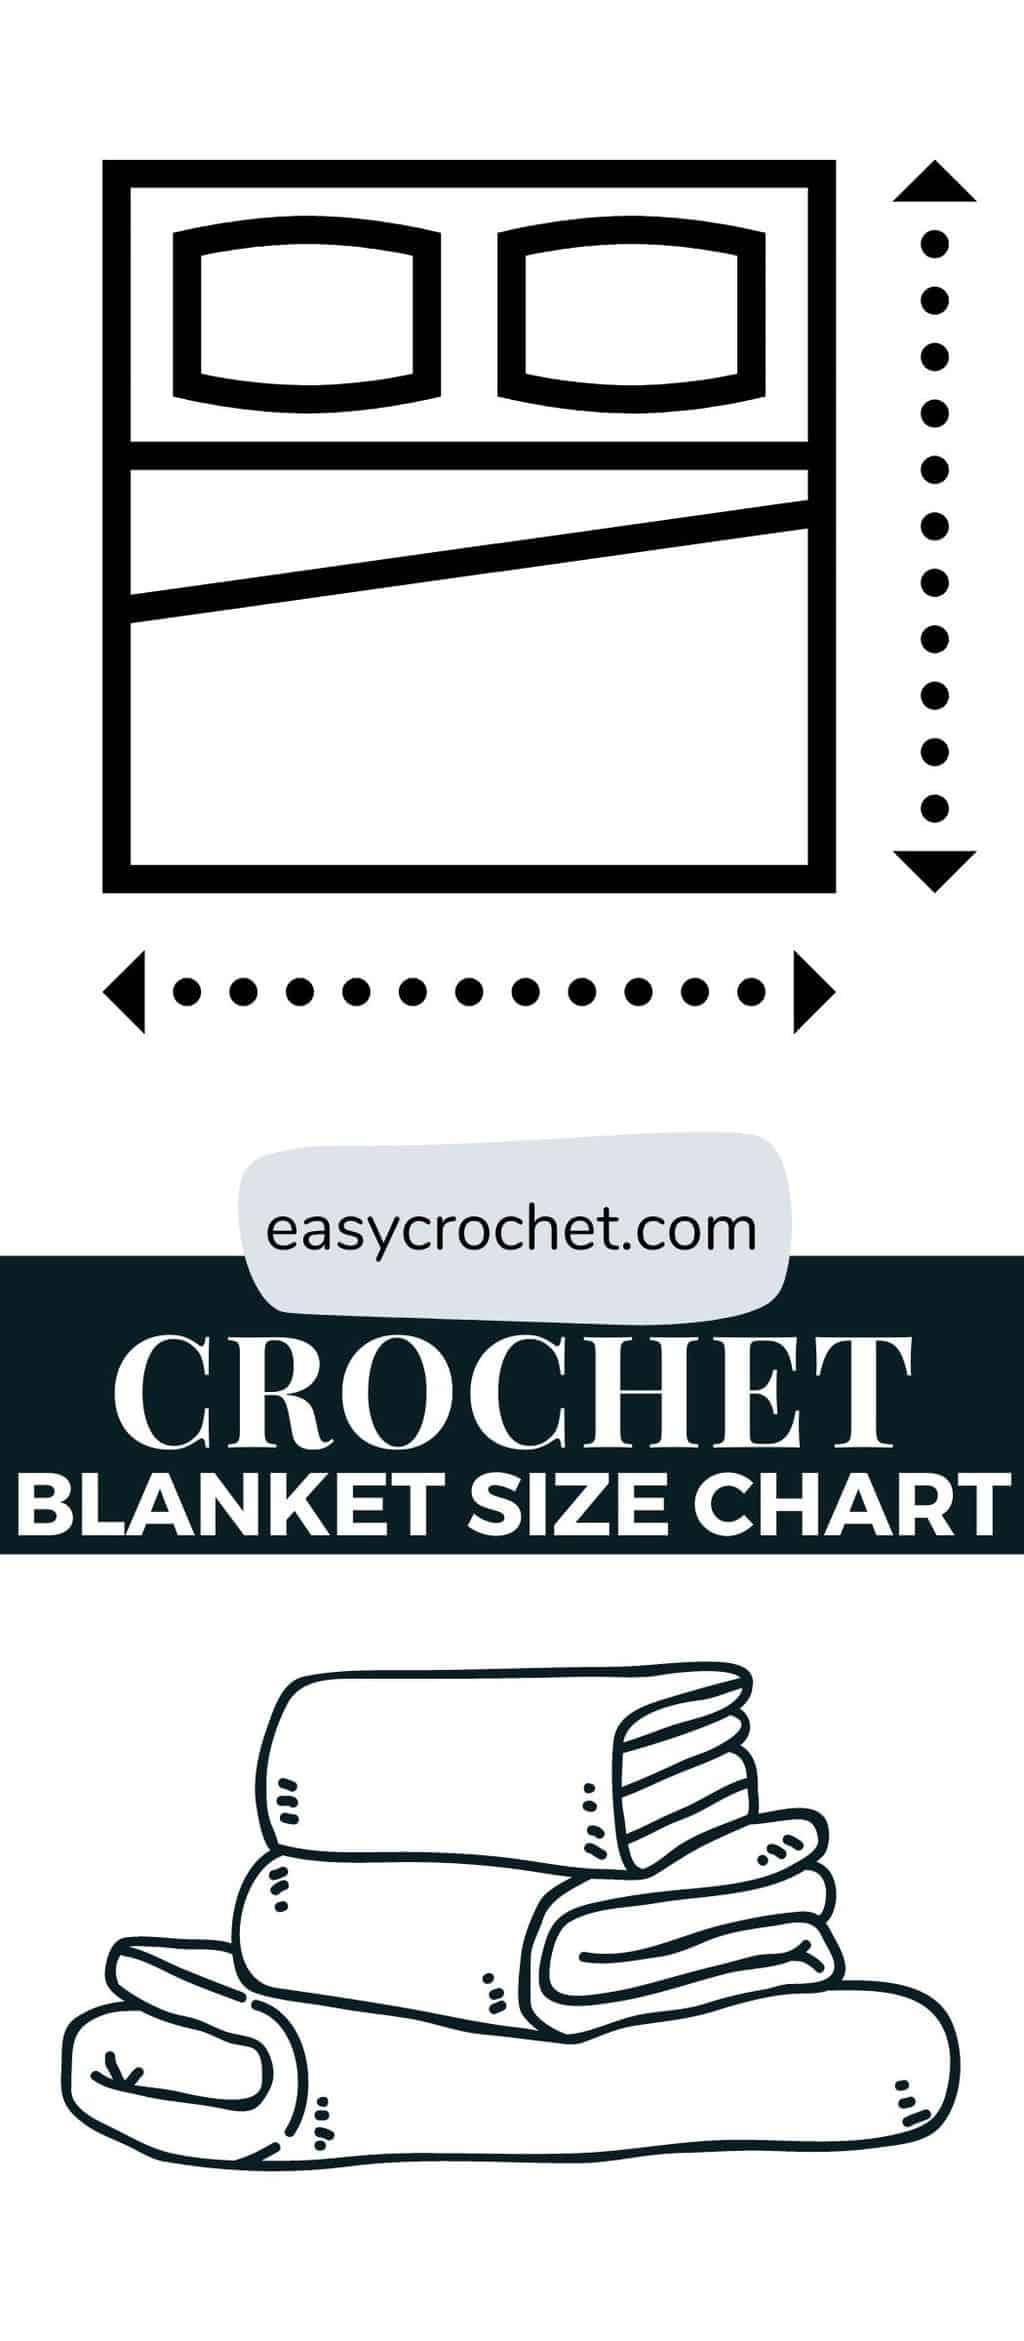 crochet blanket size chart